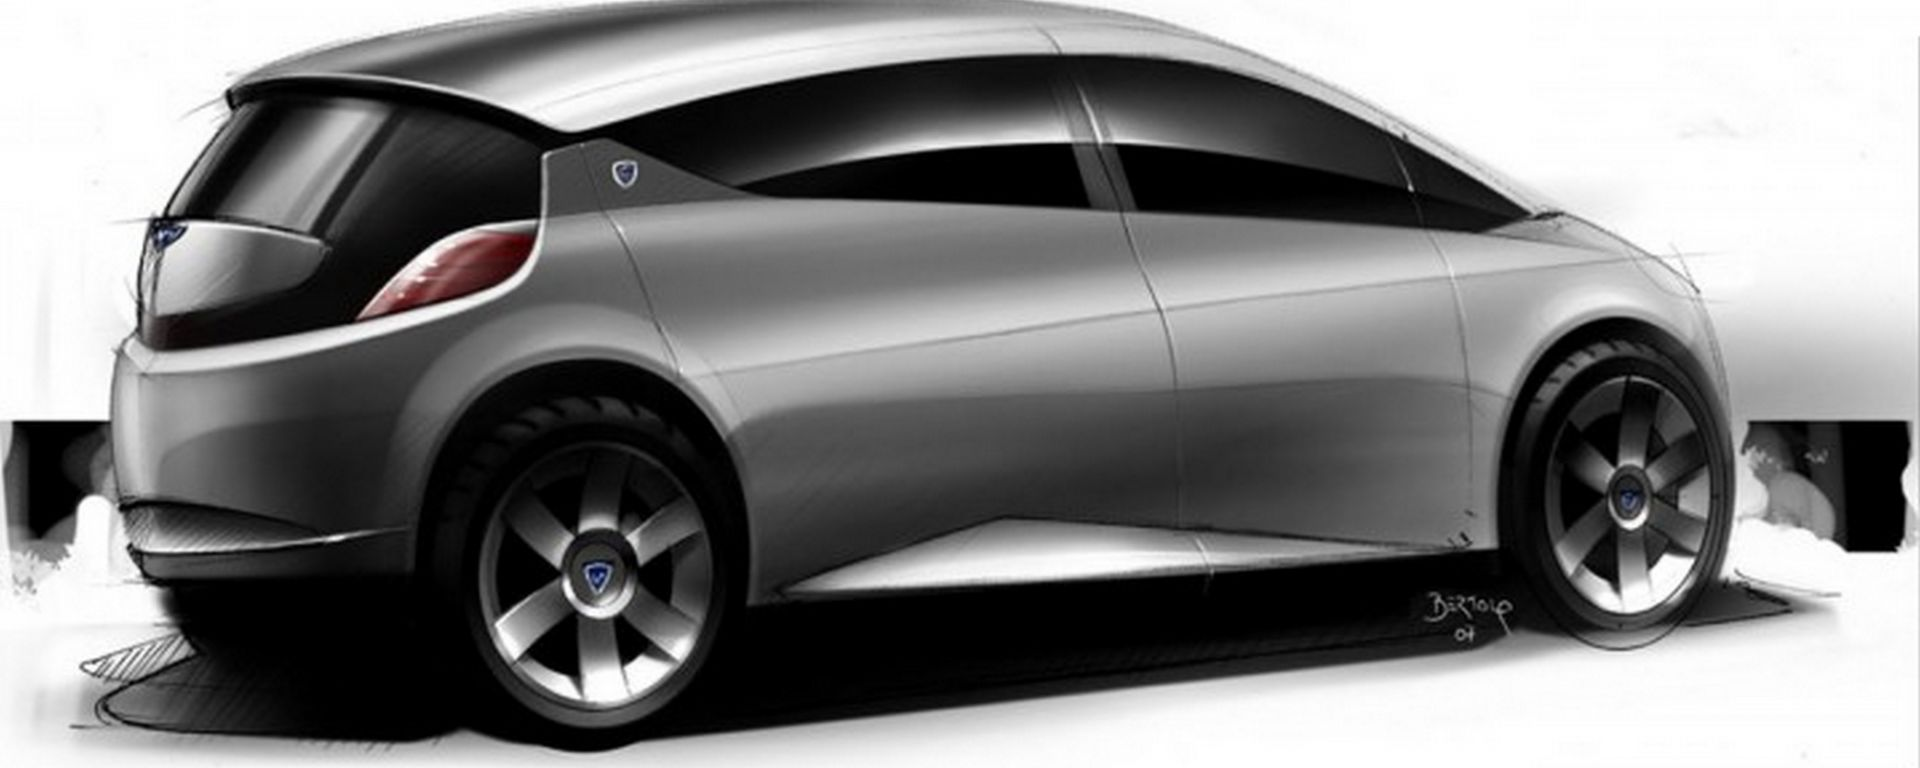 Nuova Lancia Ypsilon, dal 2024 sarà svolta full electric